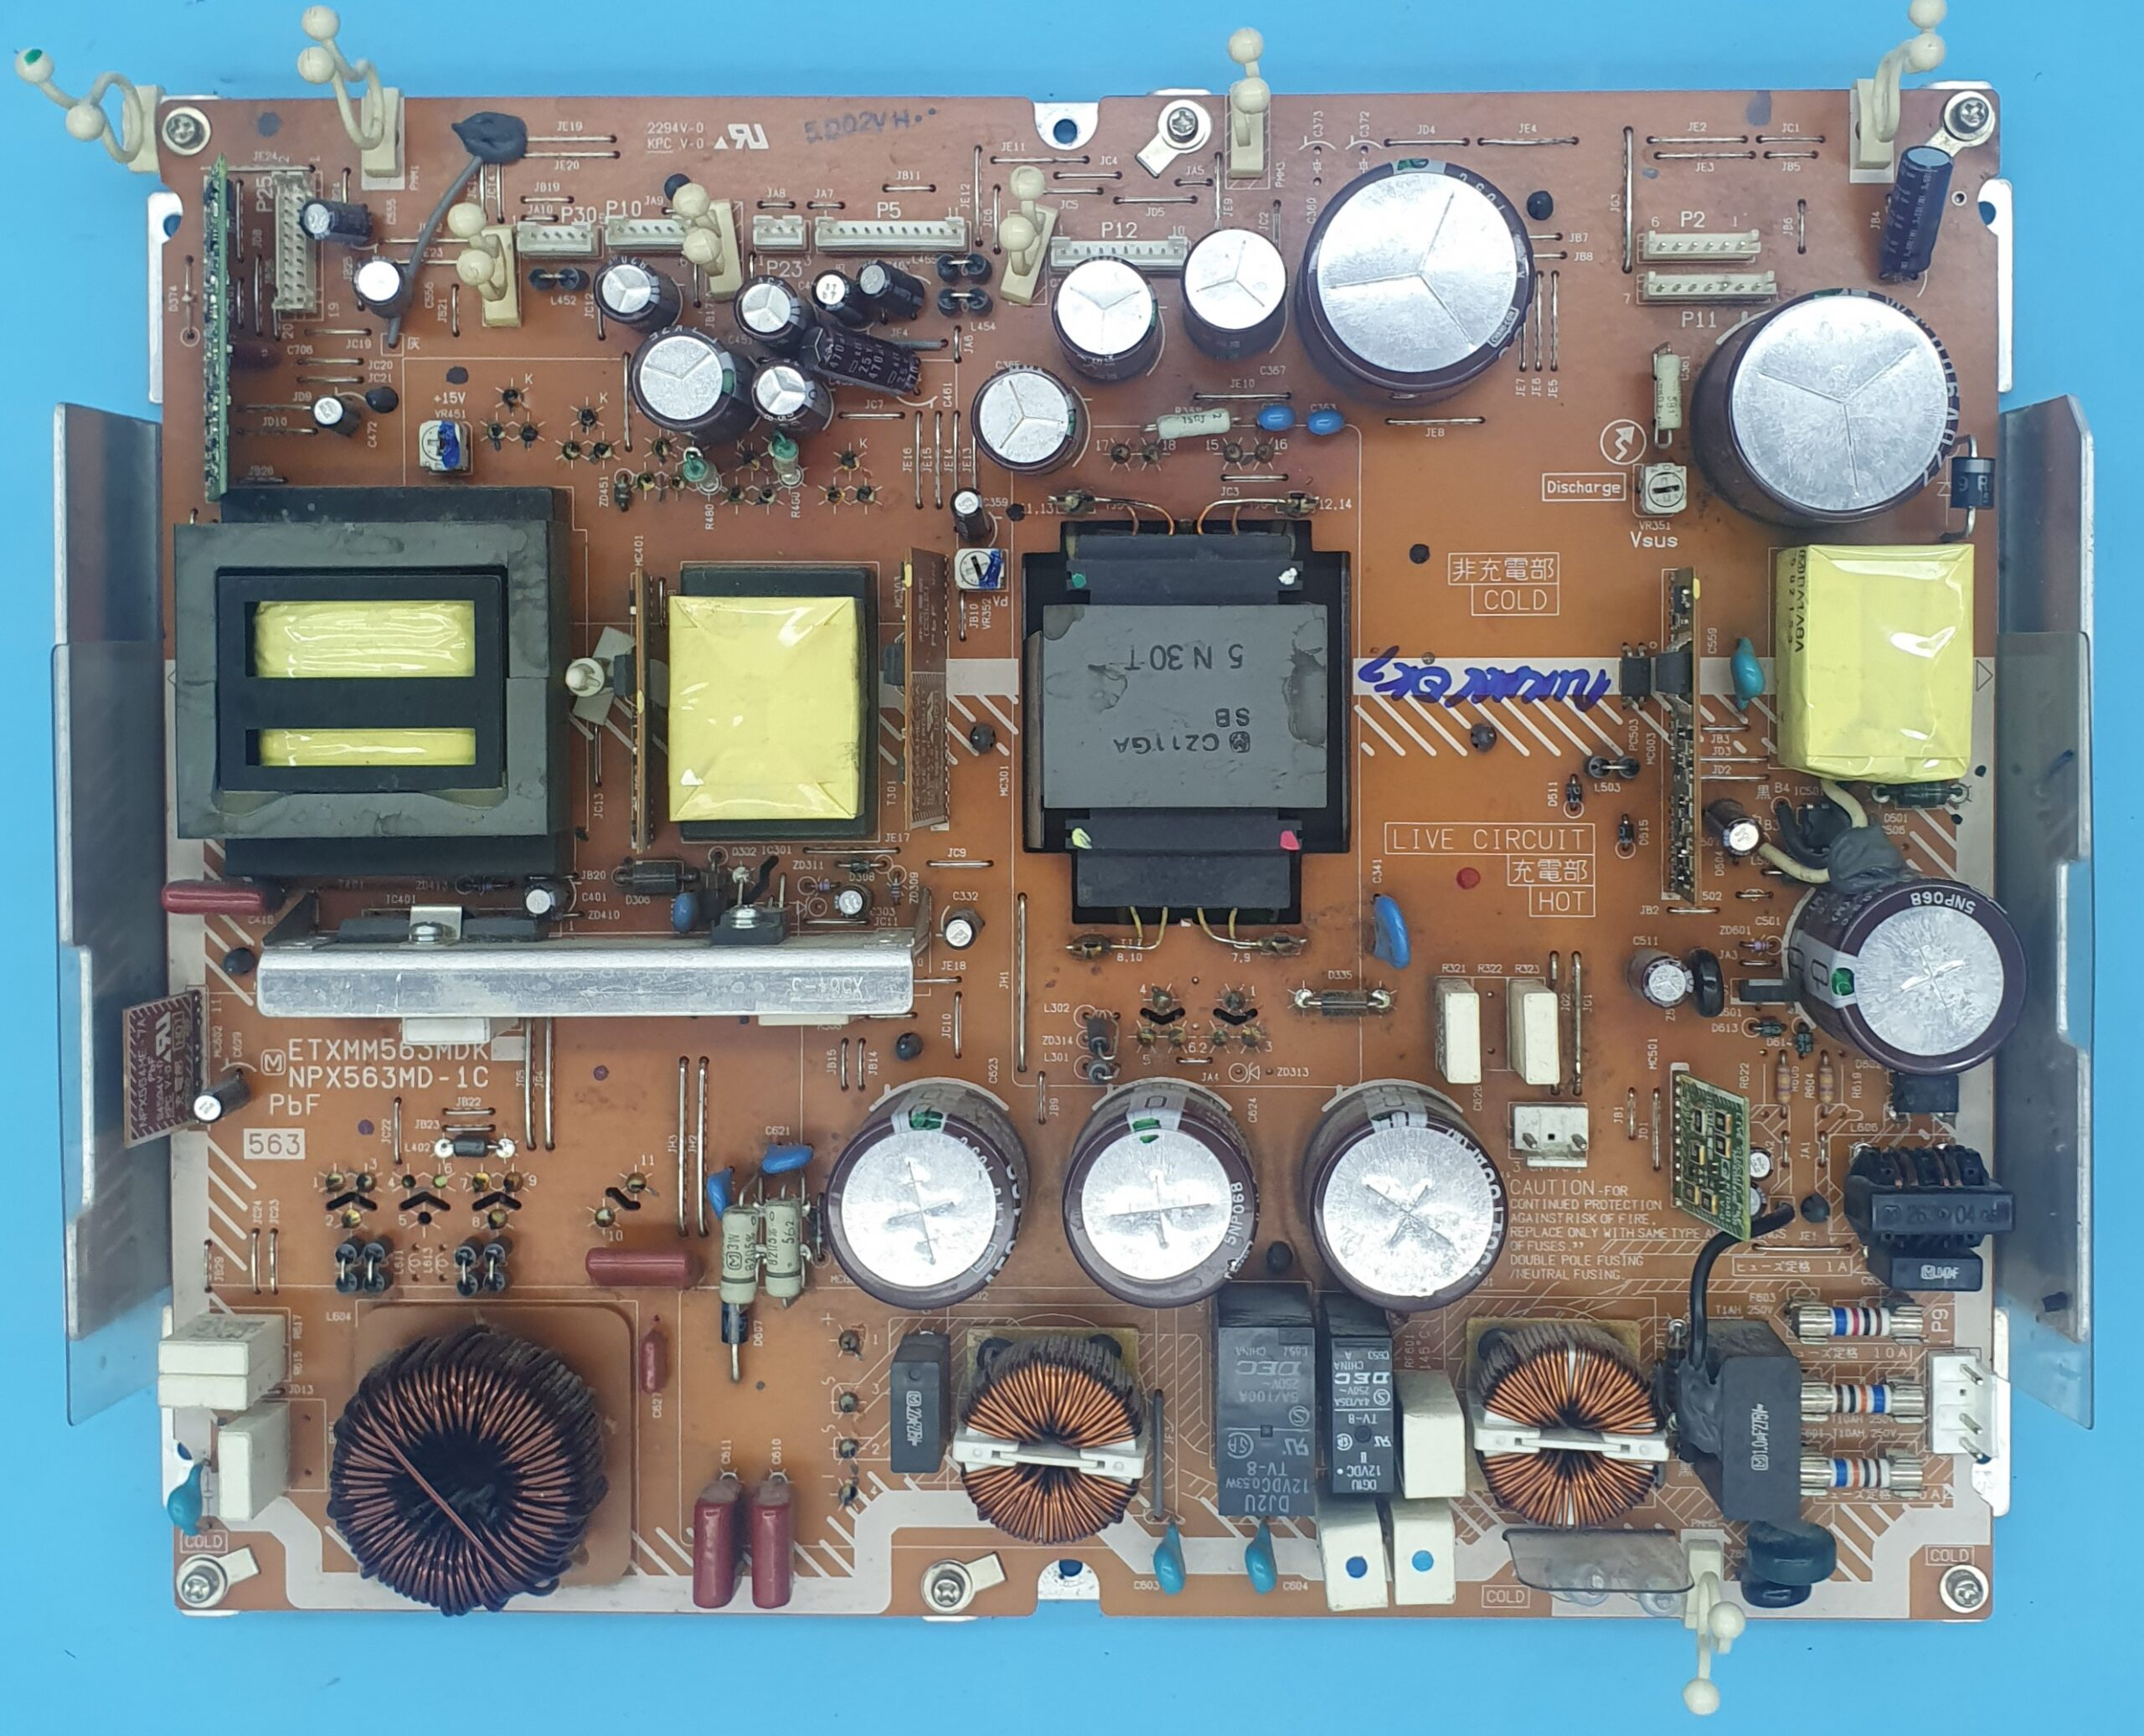 NPX563MD-1C Panasonic Power (KDV DAHİL = 130 TL)